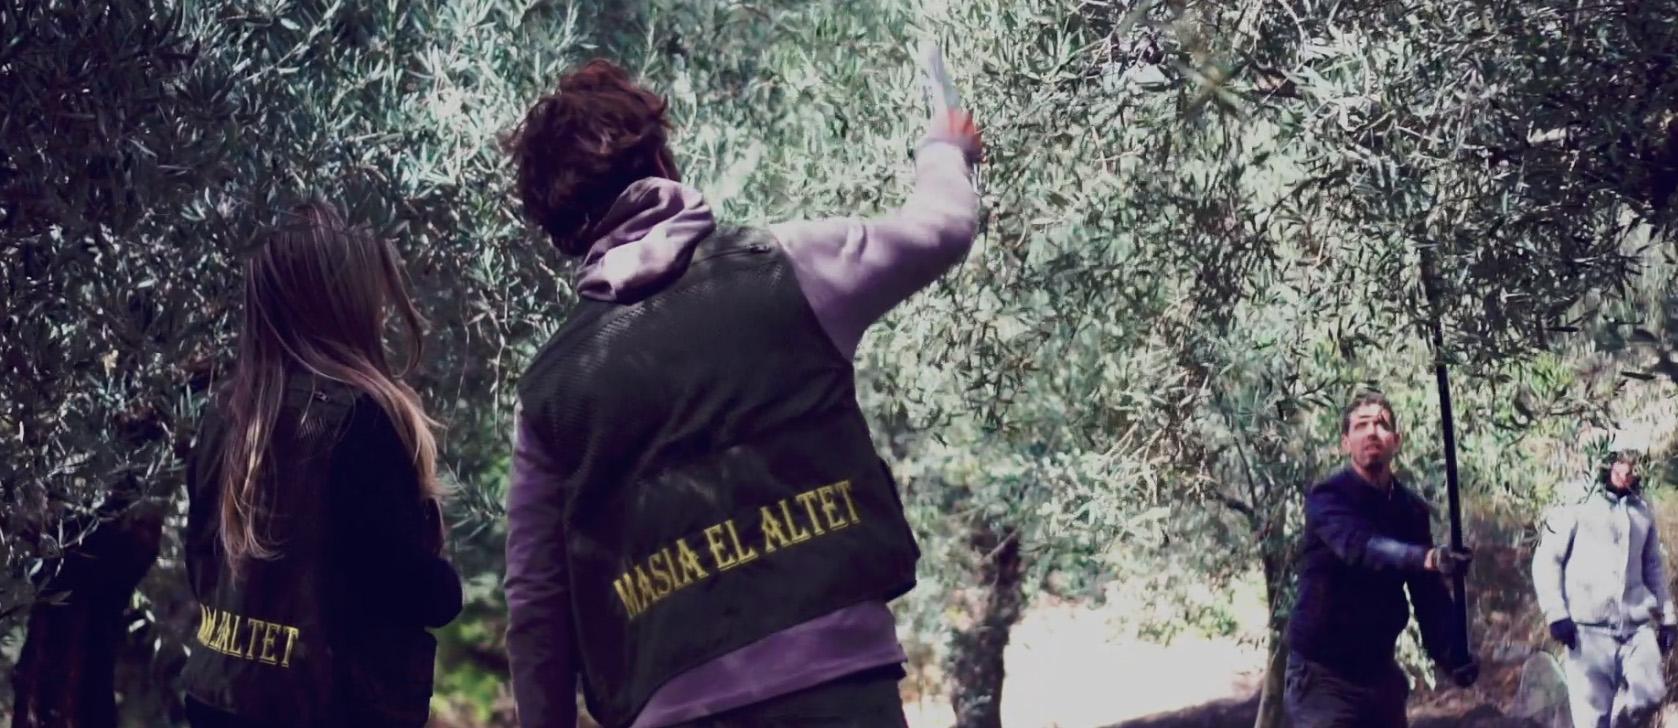 el cultivo del olivo masia el altet